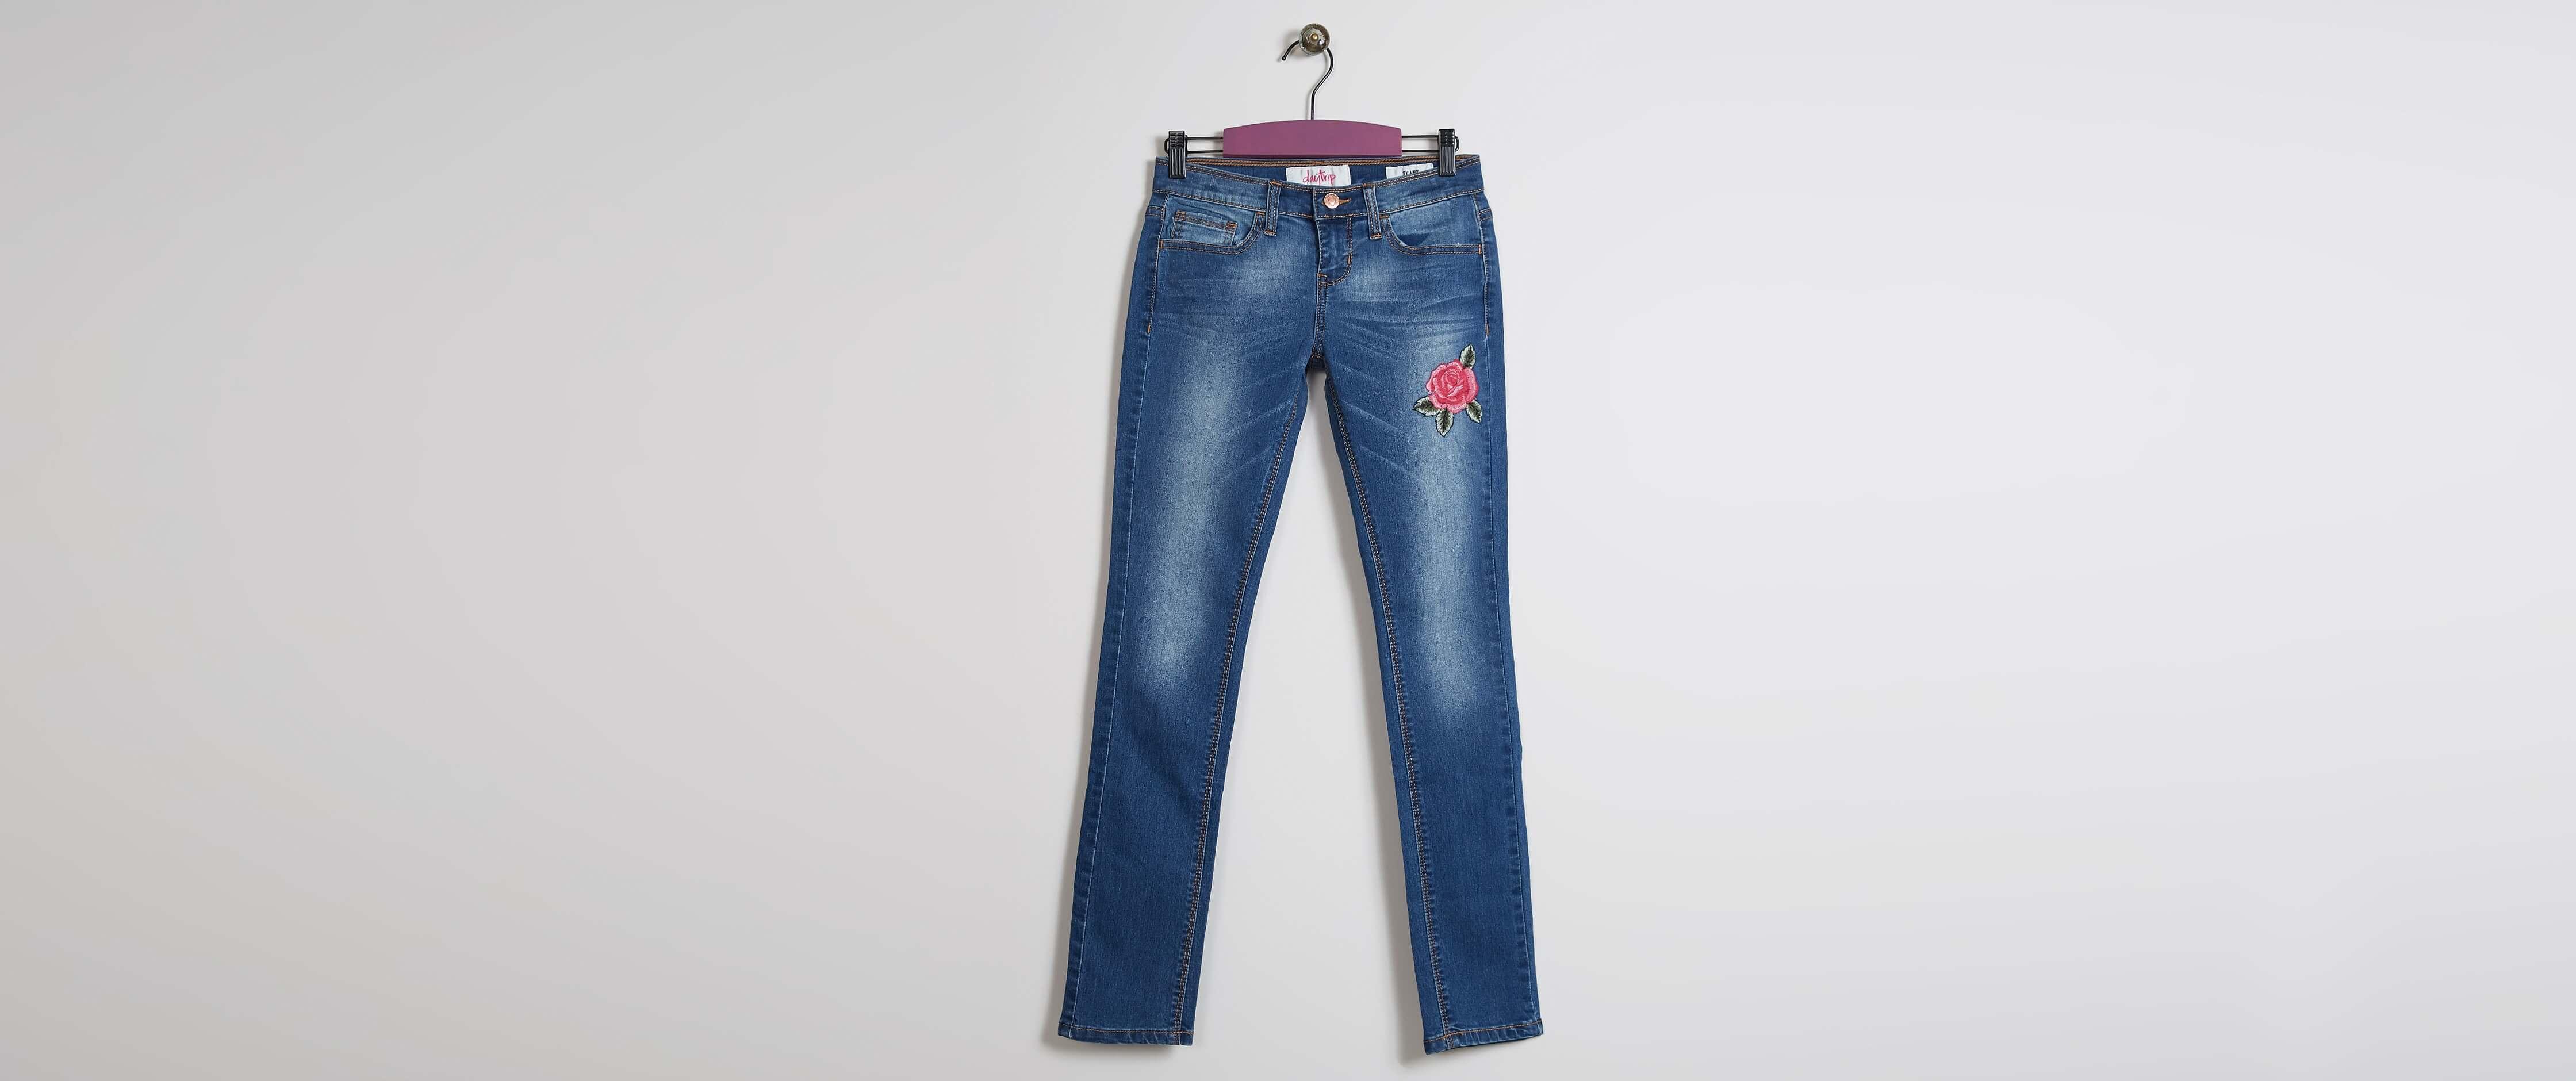 Cheap Girls - Daytrip Skinny Stretch Jean for sale